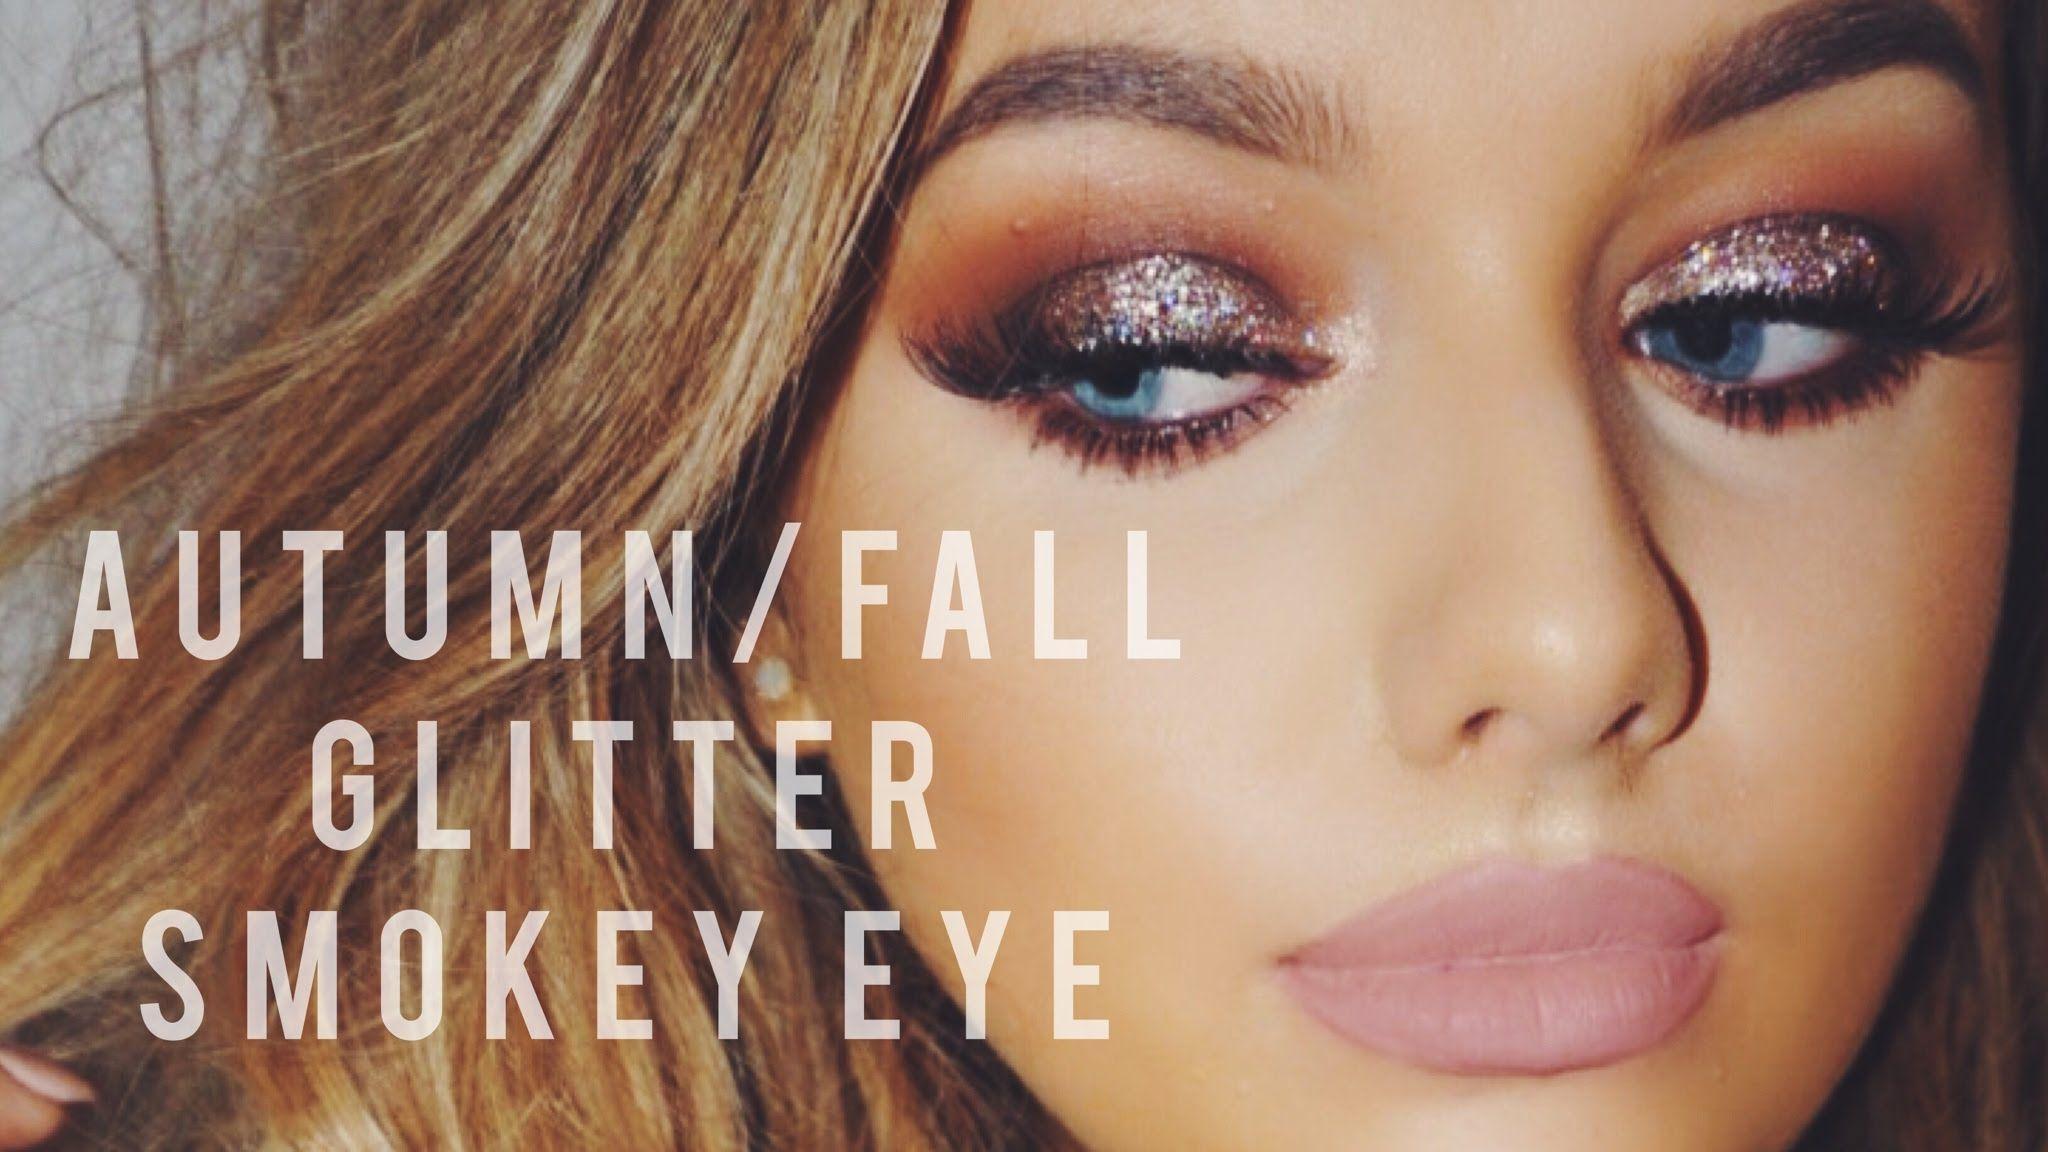 AutumnFall Glitter Smokey eye  Rachel Leary  Makeup Tutorials